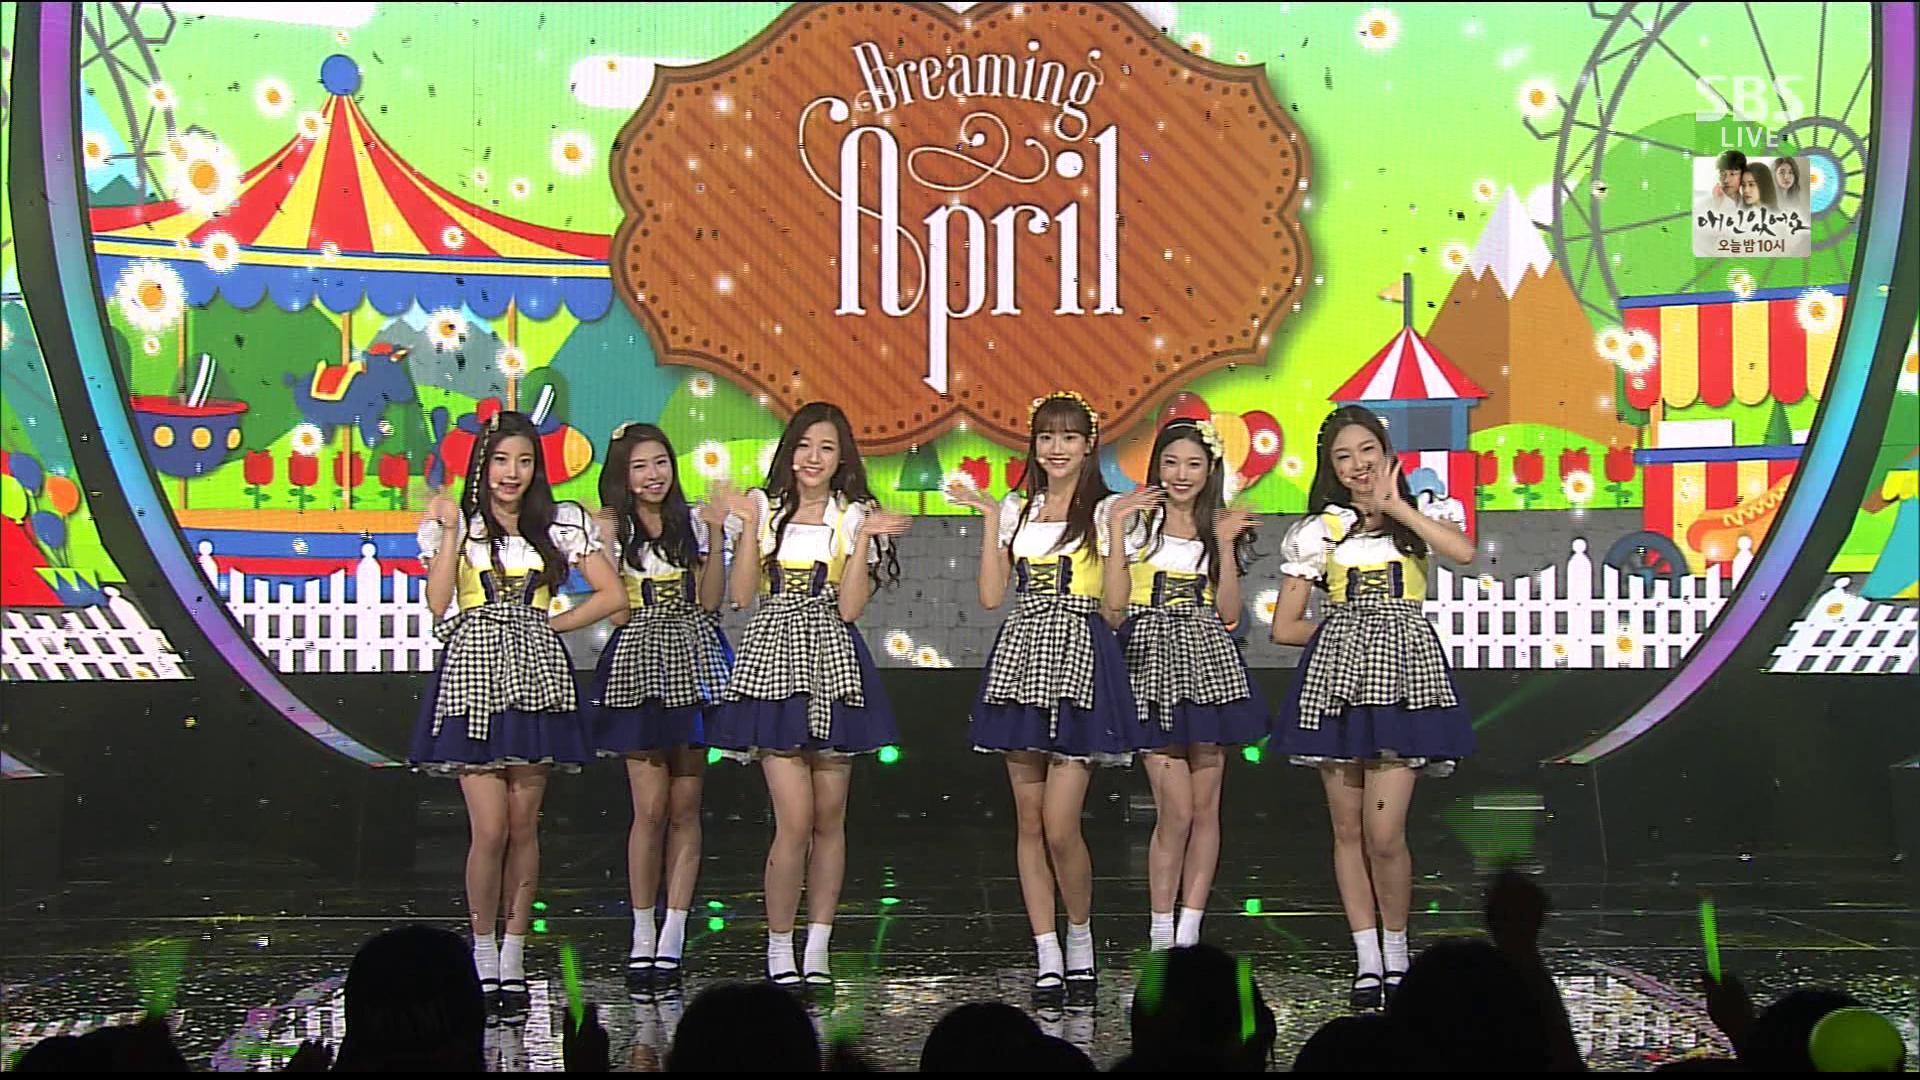 20160817.21.06 April - Dream Candy (Inkigayo 2015.09.06 HDTV) (JPOP.ru).ts 1.jpg